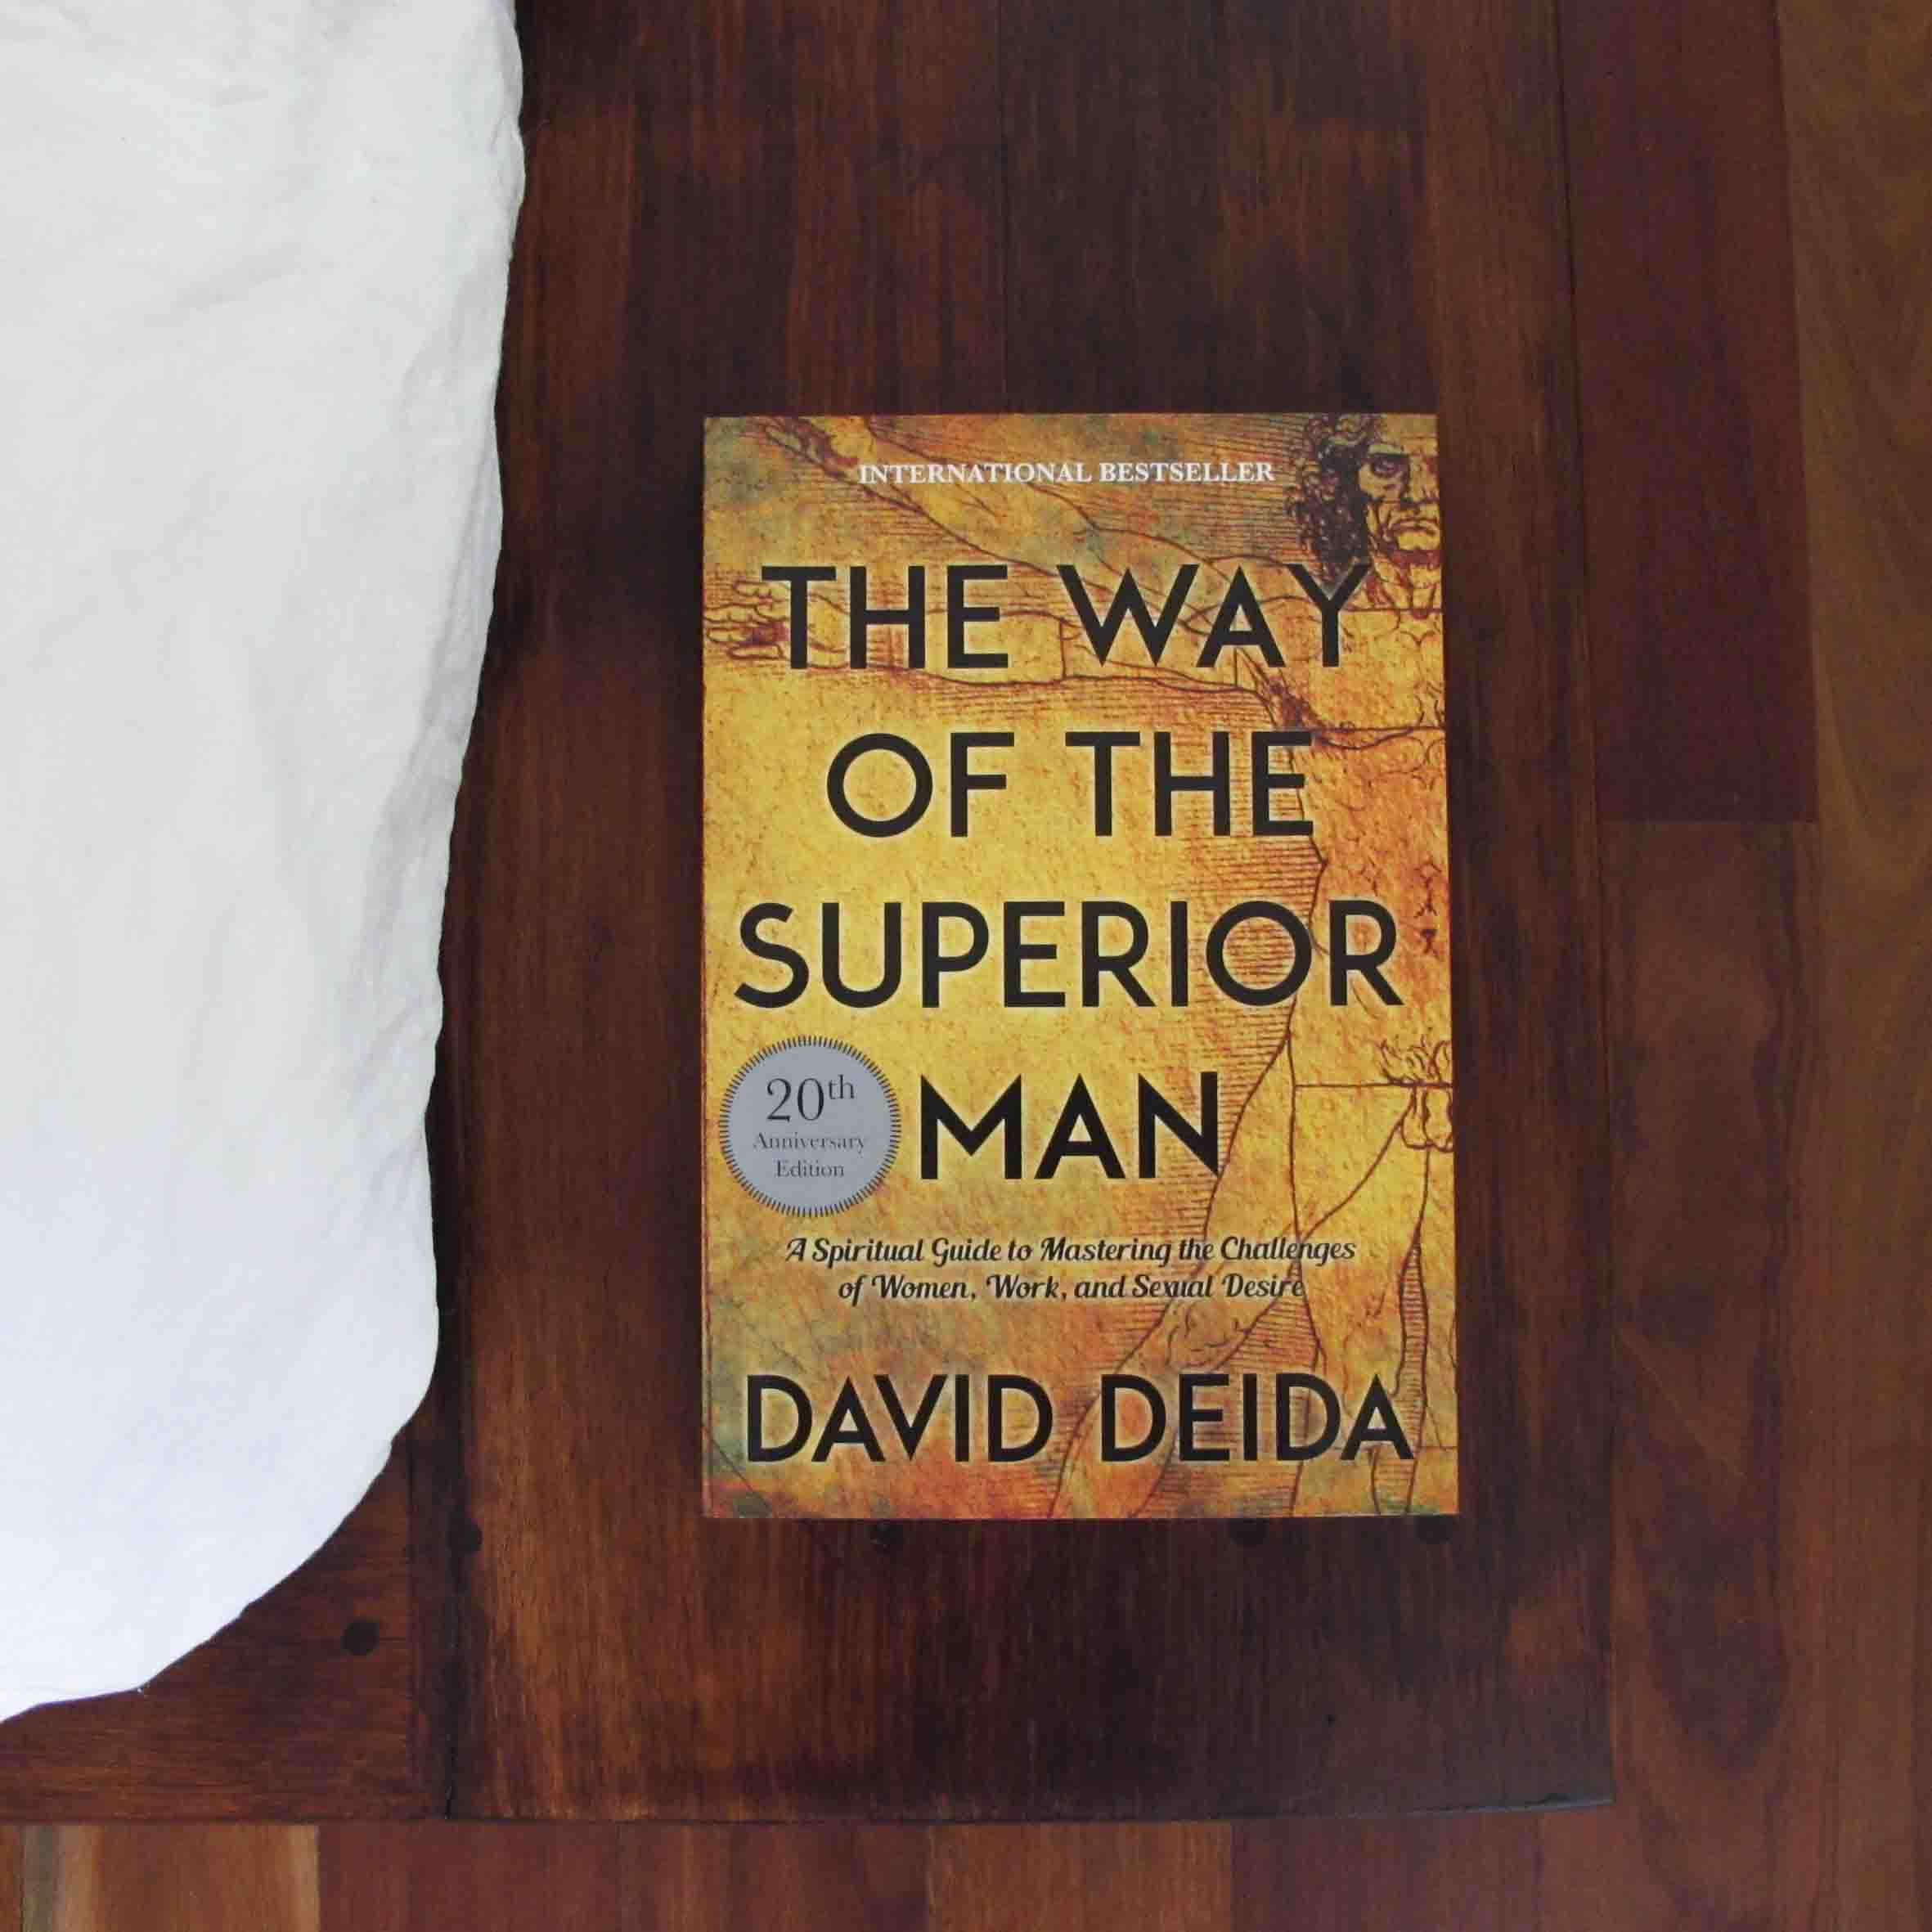 www.childoftheearthmadeoflove.com-the-way-of-the-superior-man-david-deida.jpg